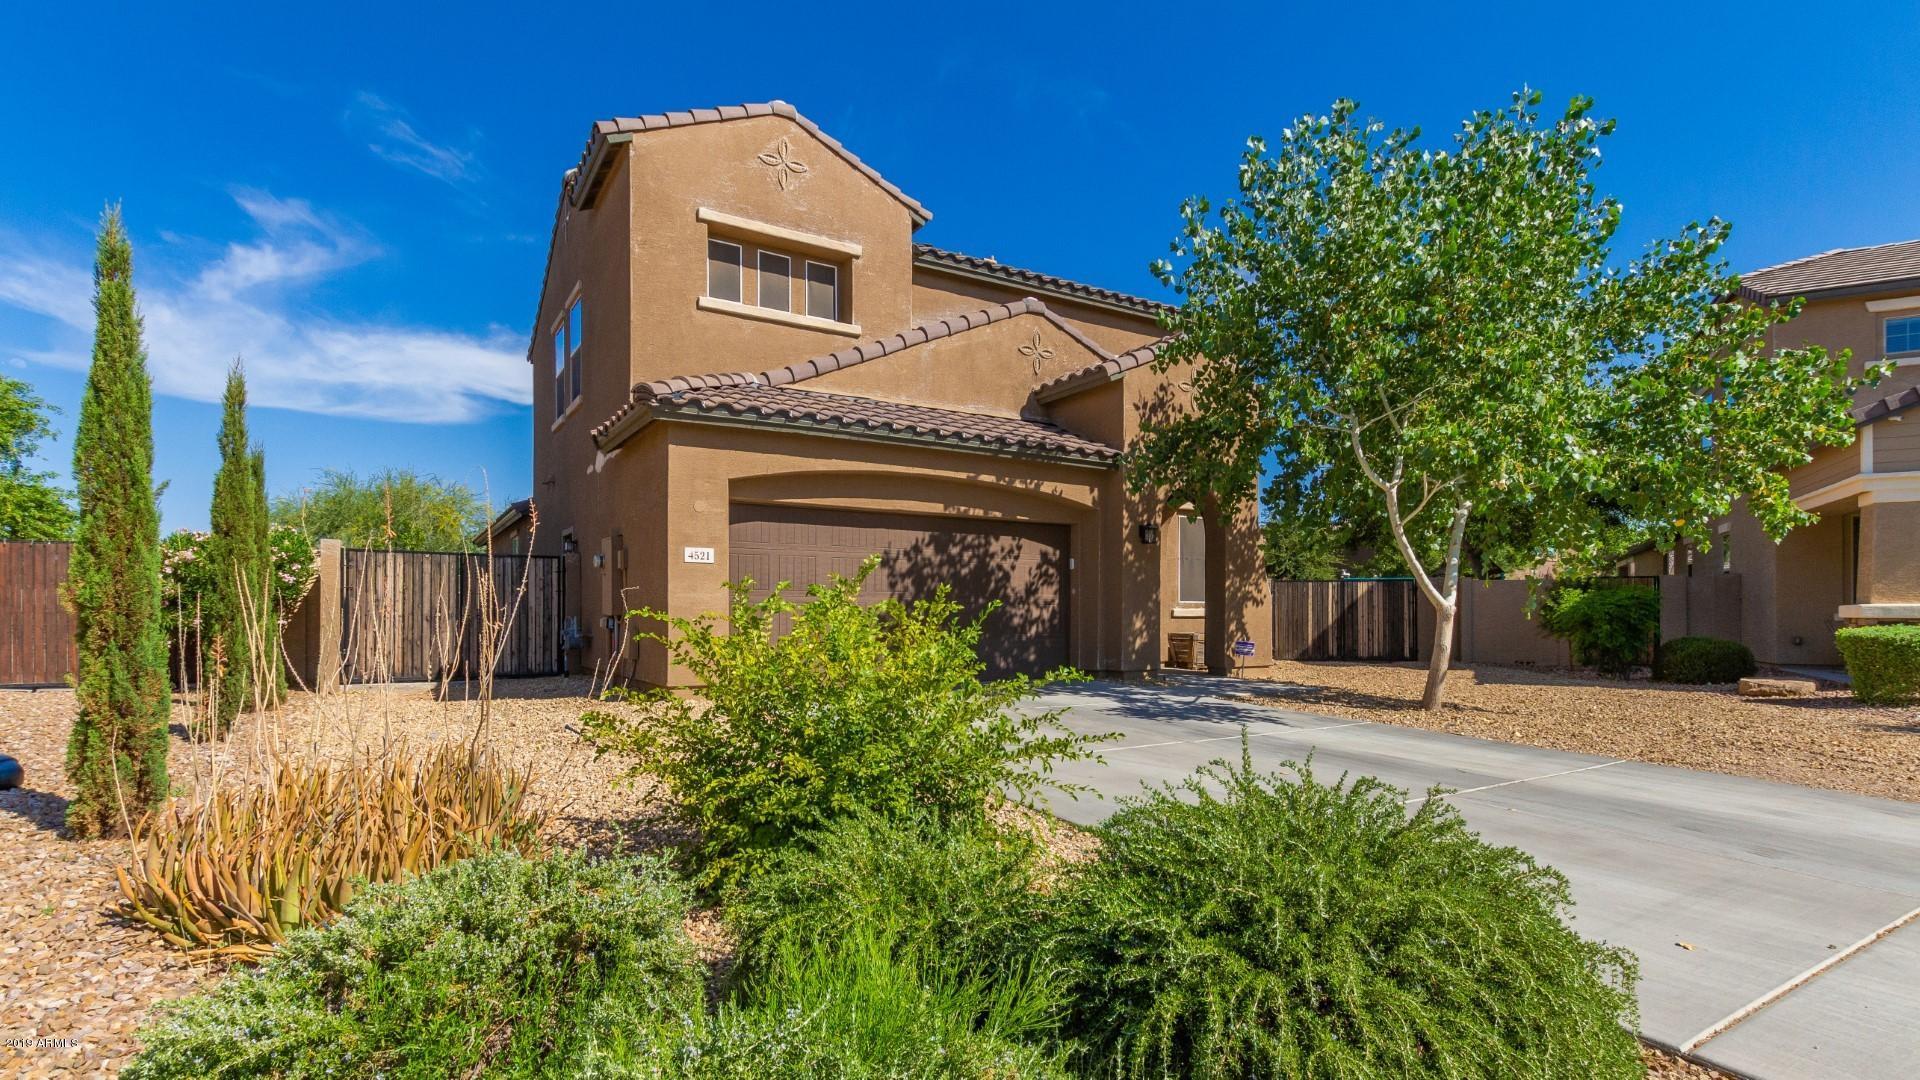 Photo of 4521 S Antonio --, Mesa, AZ 85212